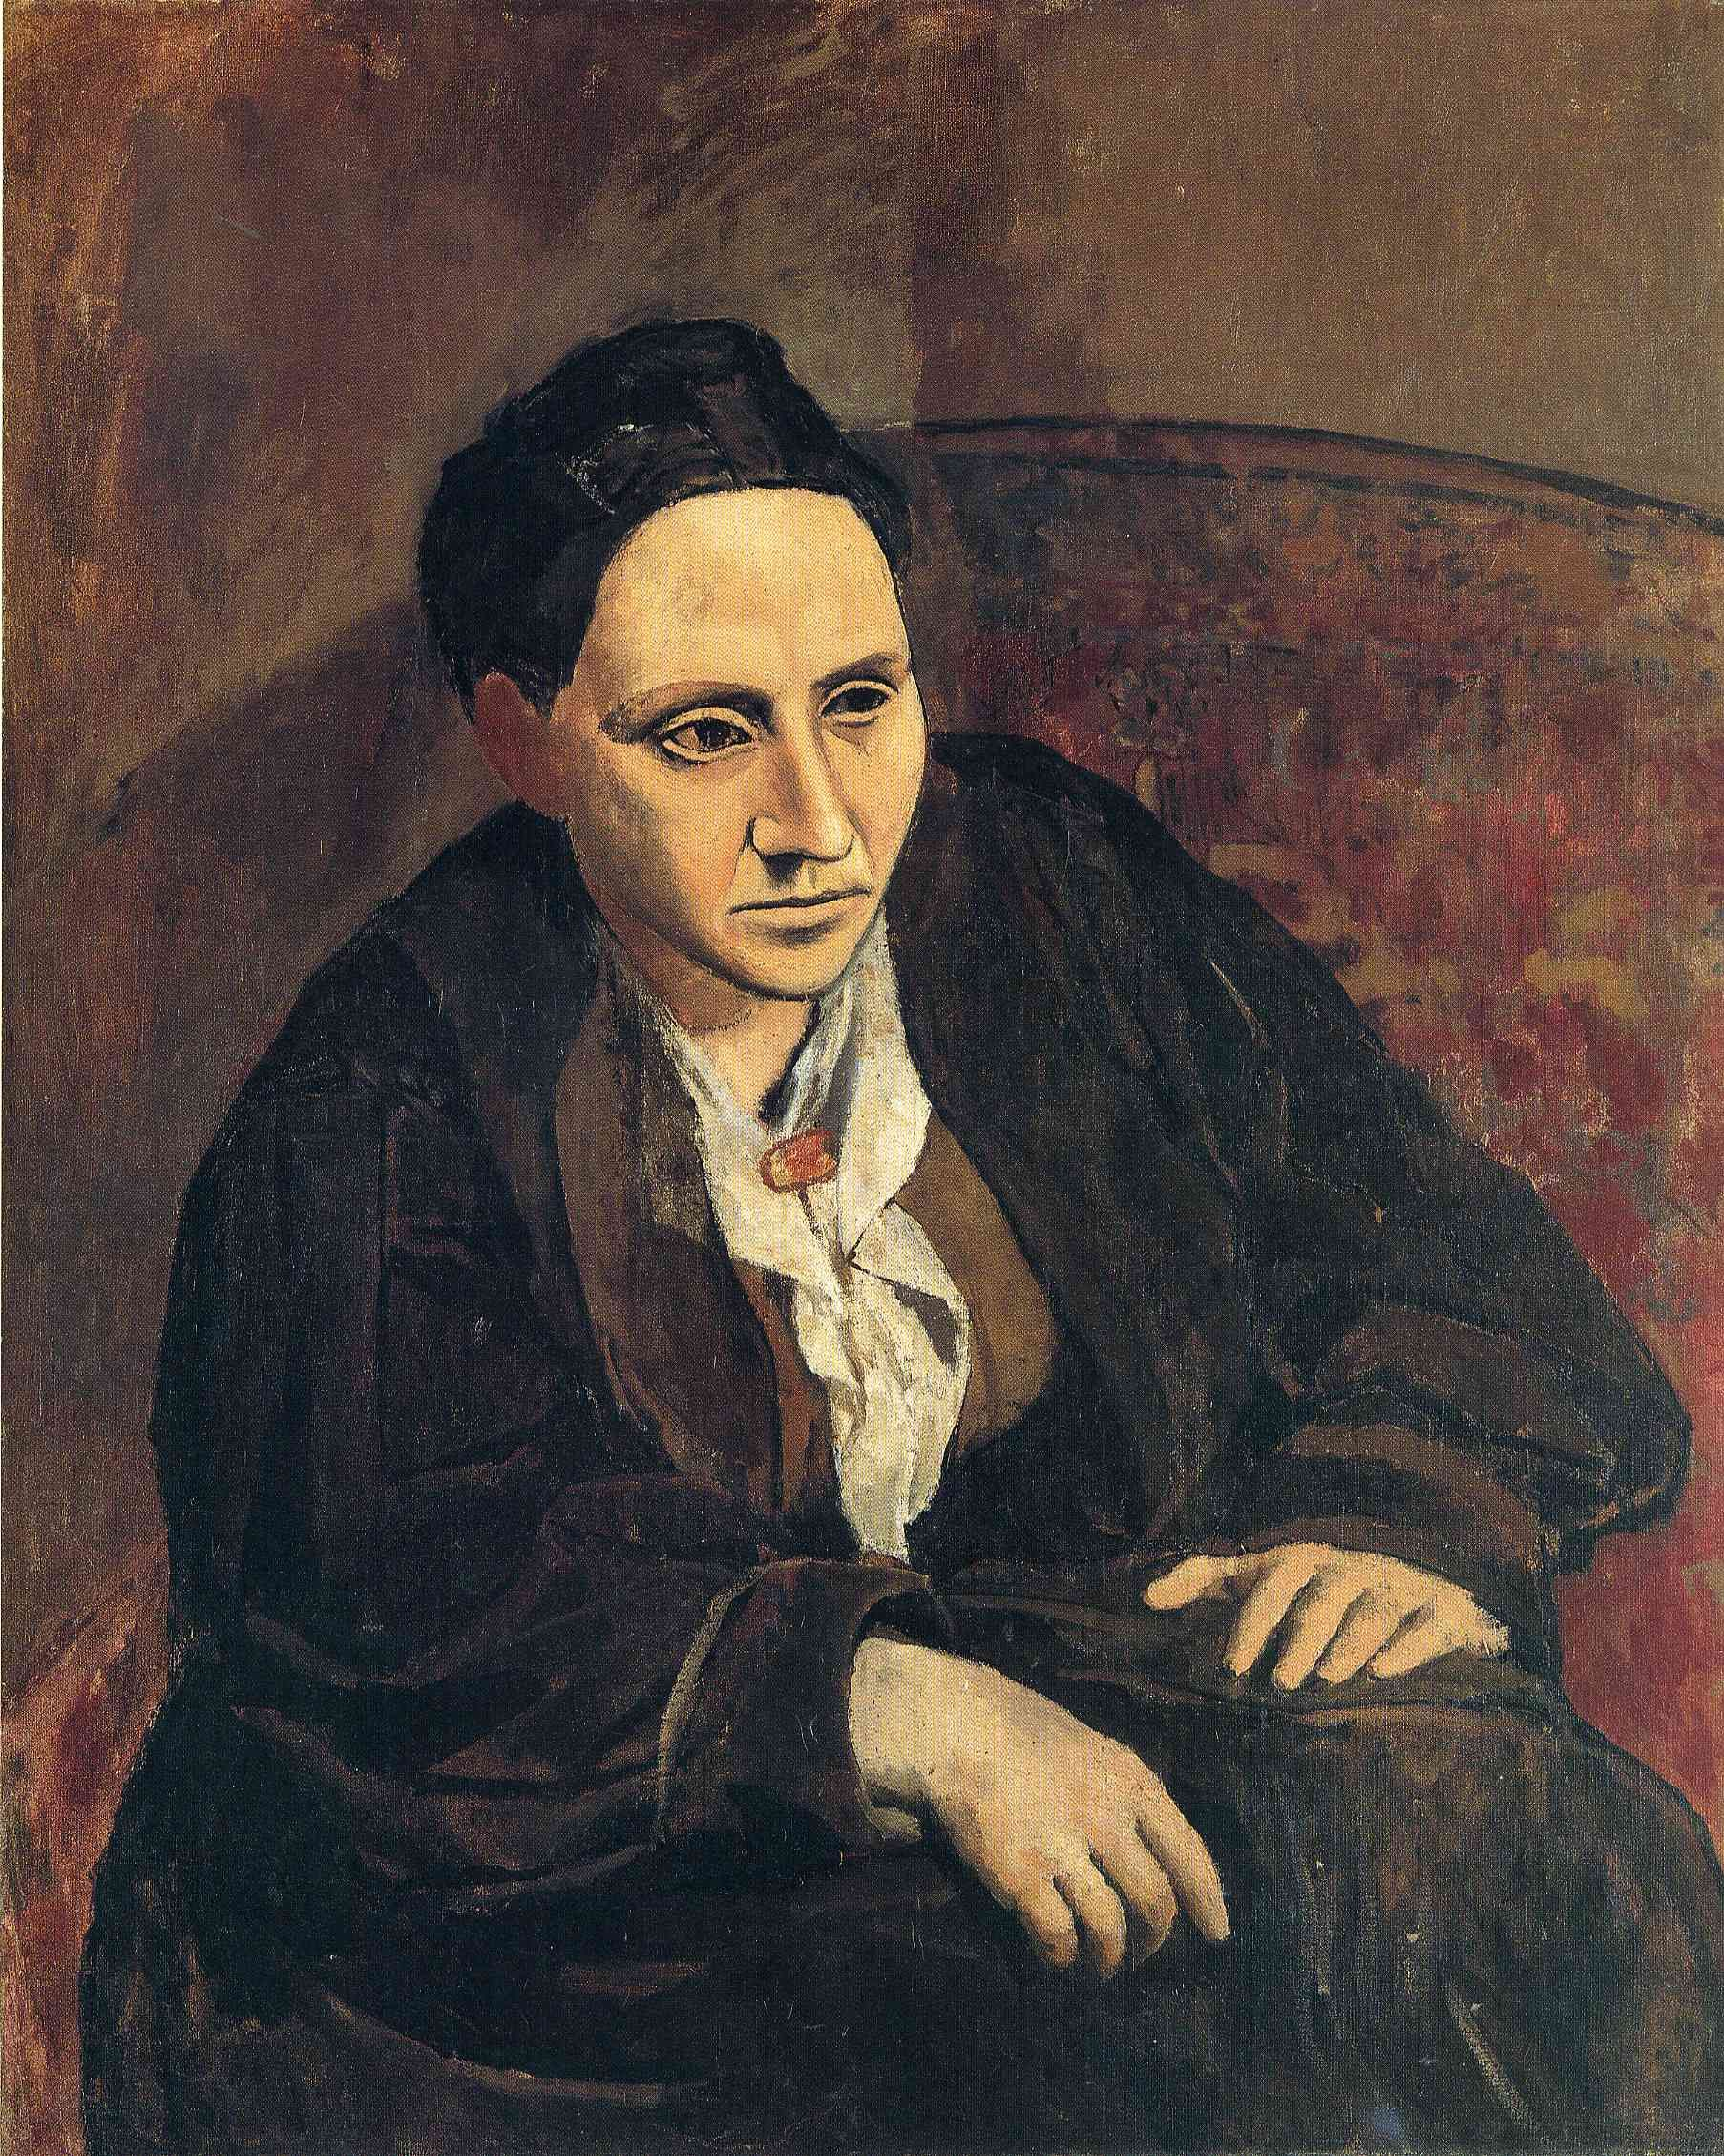 Portrait of Gertrude Stein  Portrait de Gertrude Stein  enlarge      Artist: Pablo Picasso  Completion Date: 1906  Style: Symbolism  Period: Rose Period  Genre: portrait